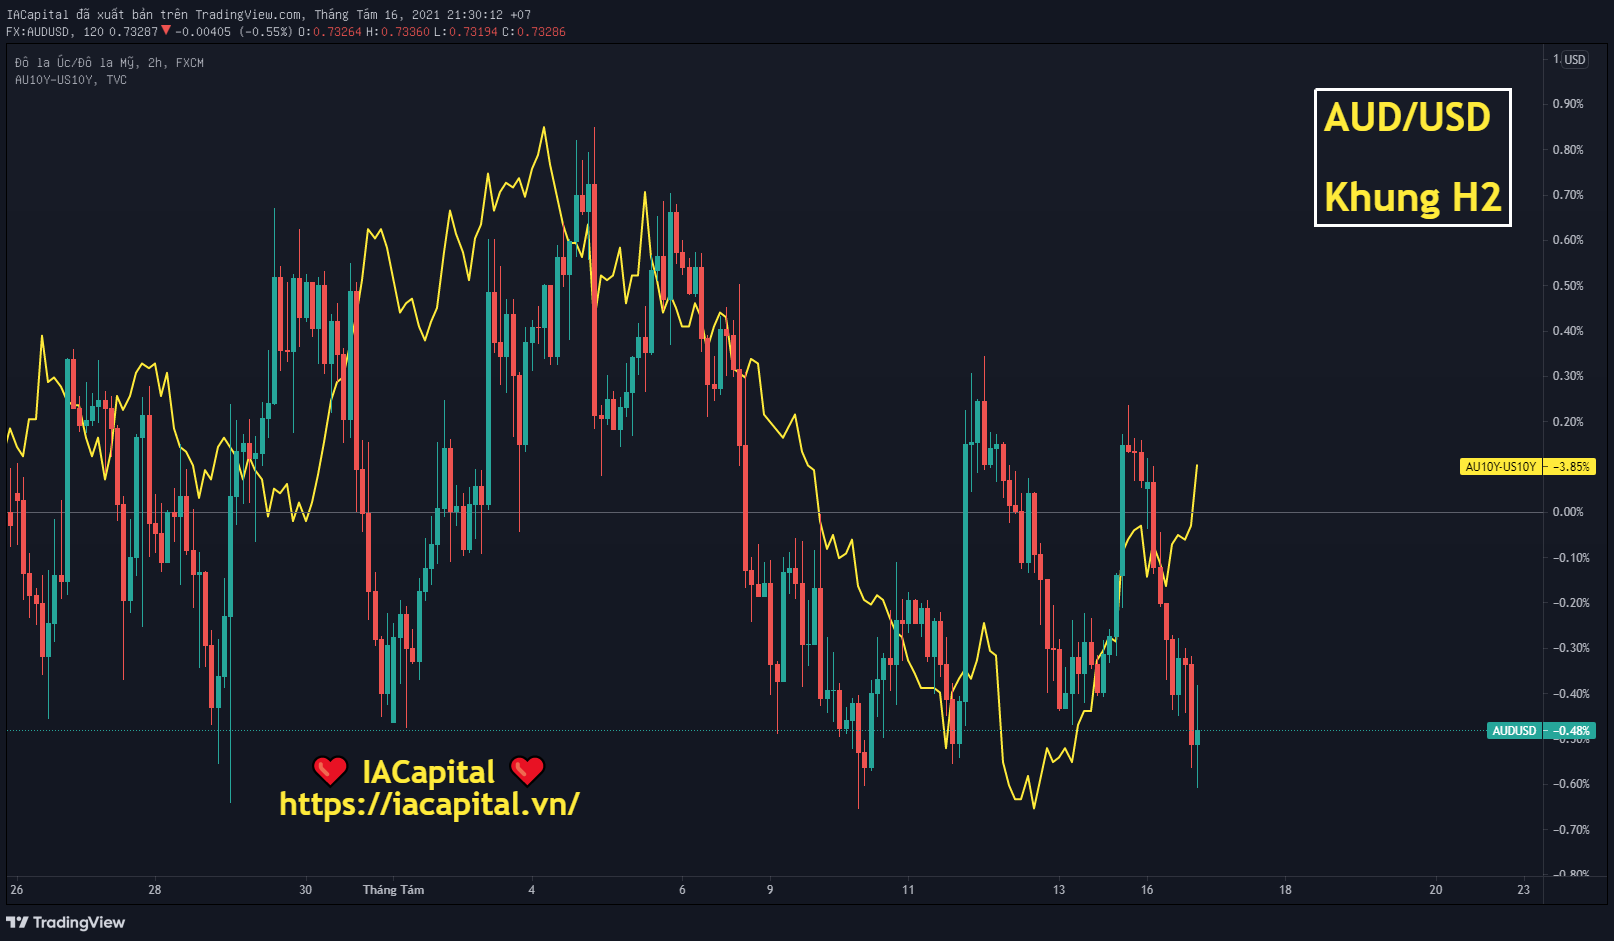 https://s3.tradingview.com/snapshots/4/4kPf3uiJ.png